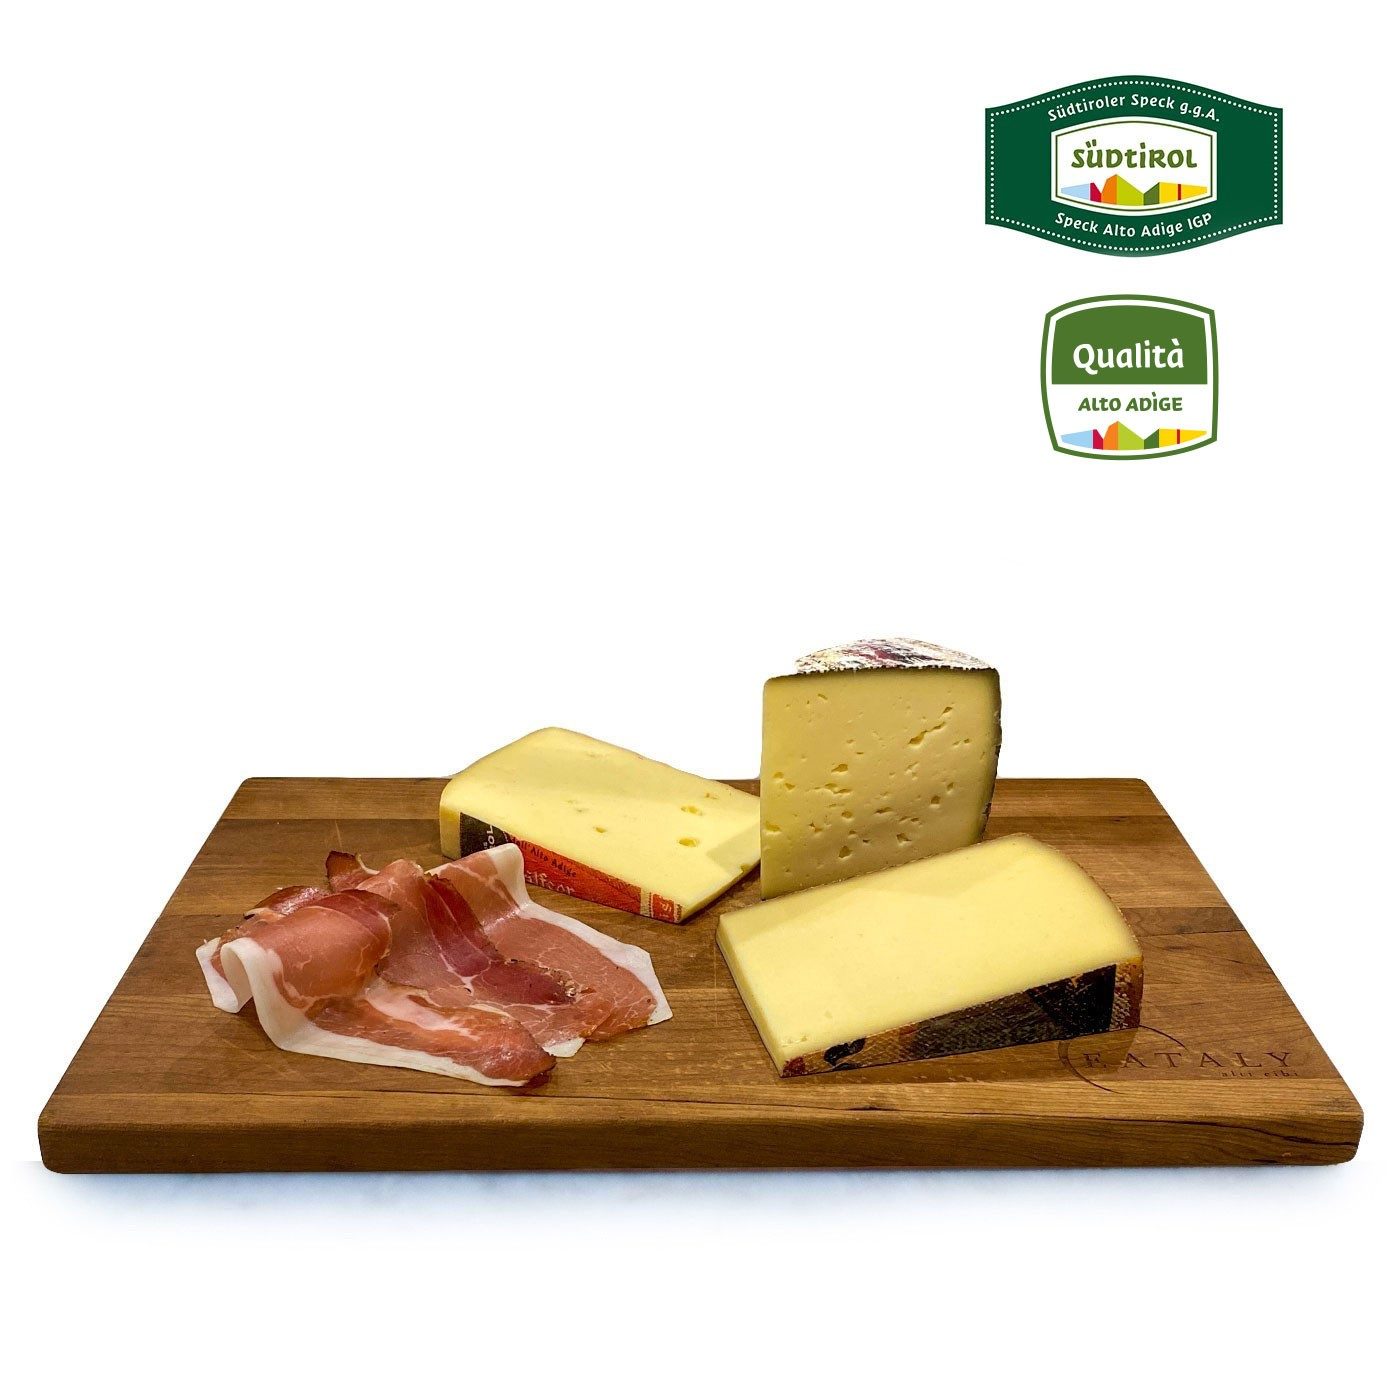 IDM Alto Adige - Südtirol Cured Meats and Cheese Bundle